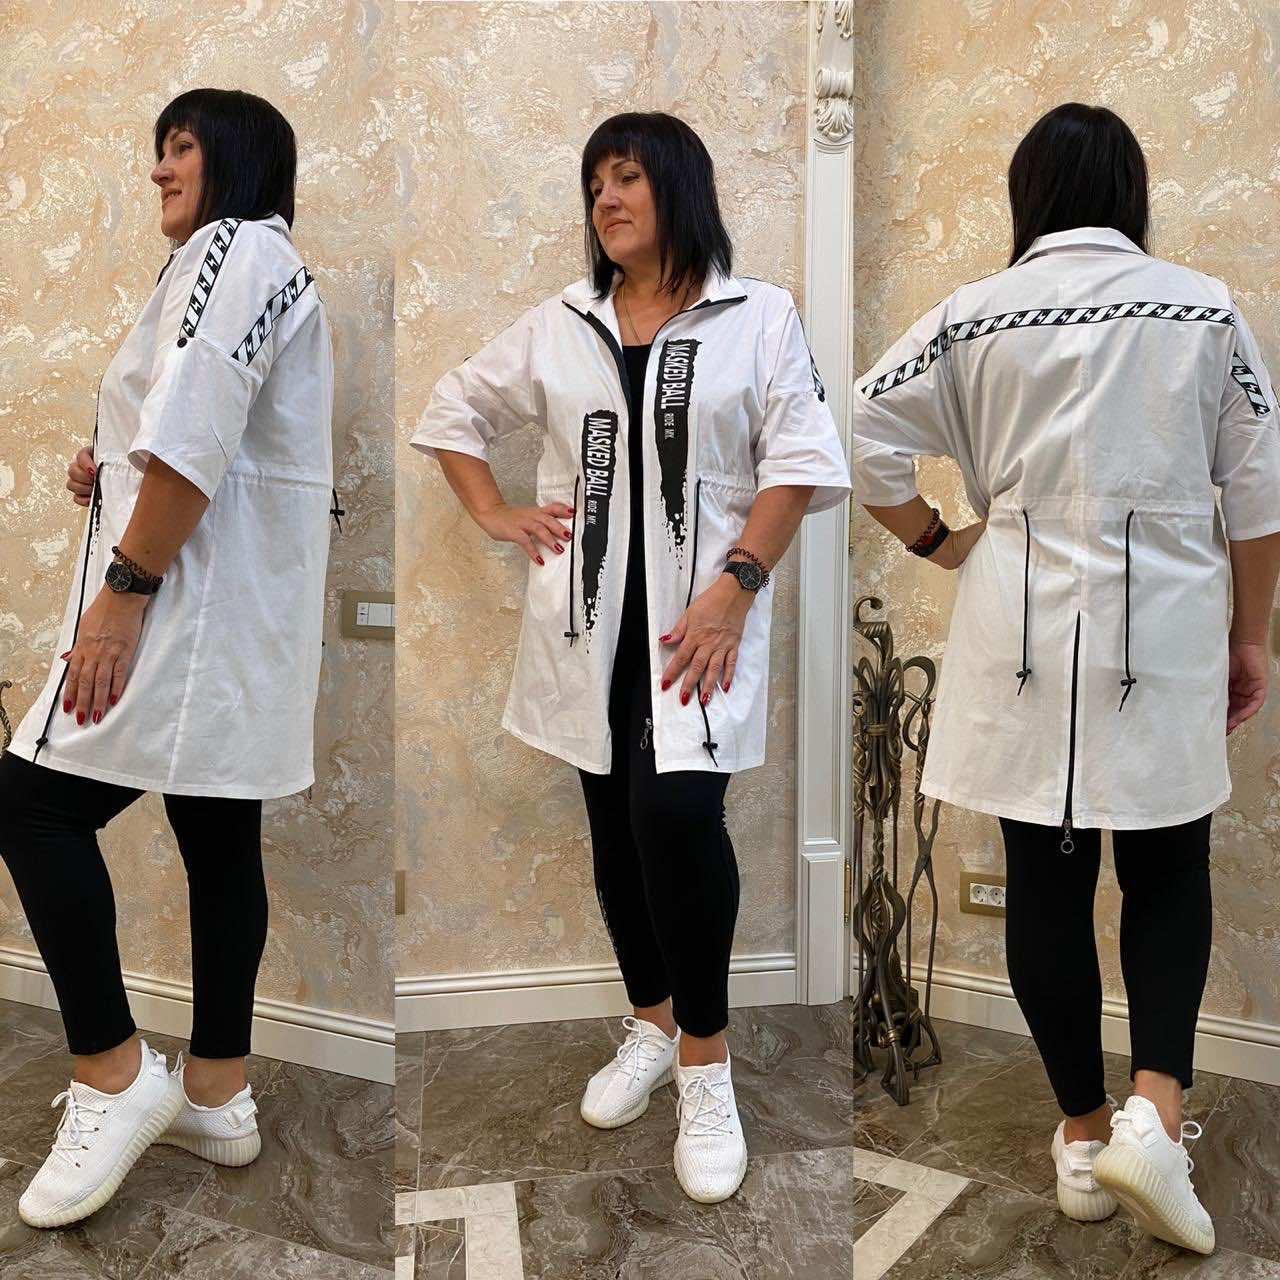 Пиджак на молнии лето арт.CDM-ELEMENT'S батал белый / белого цвета